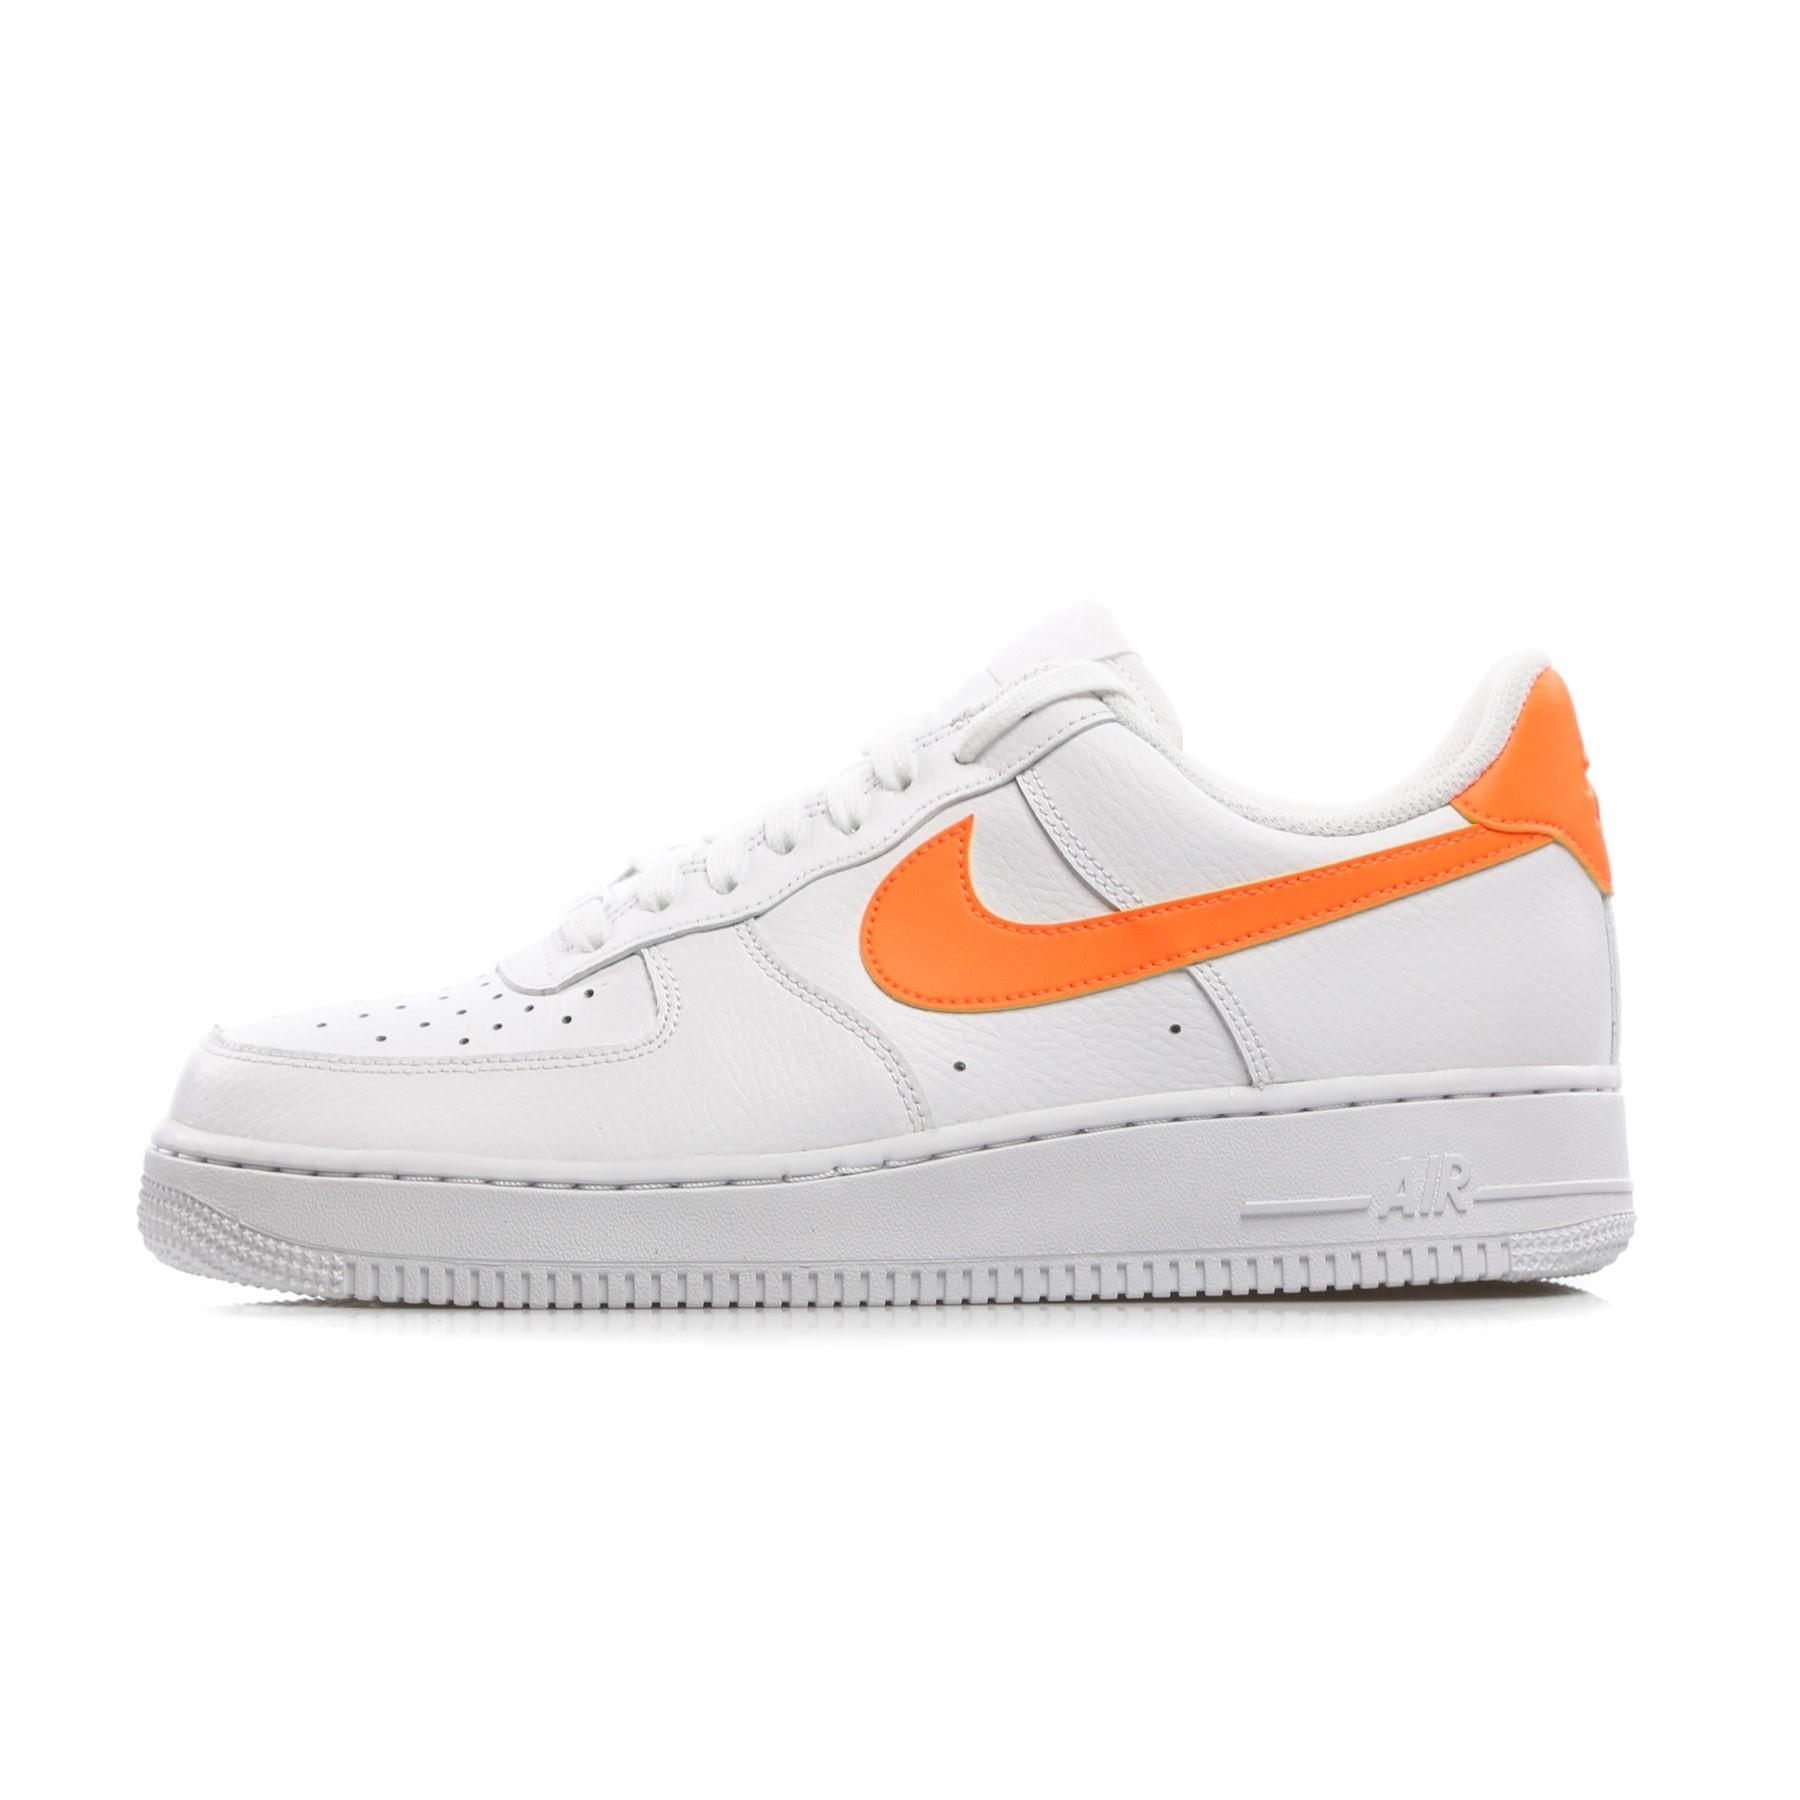 nike air force 1 '07 patent orange